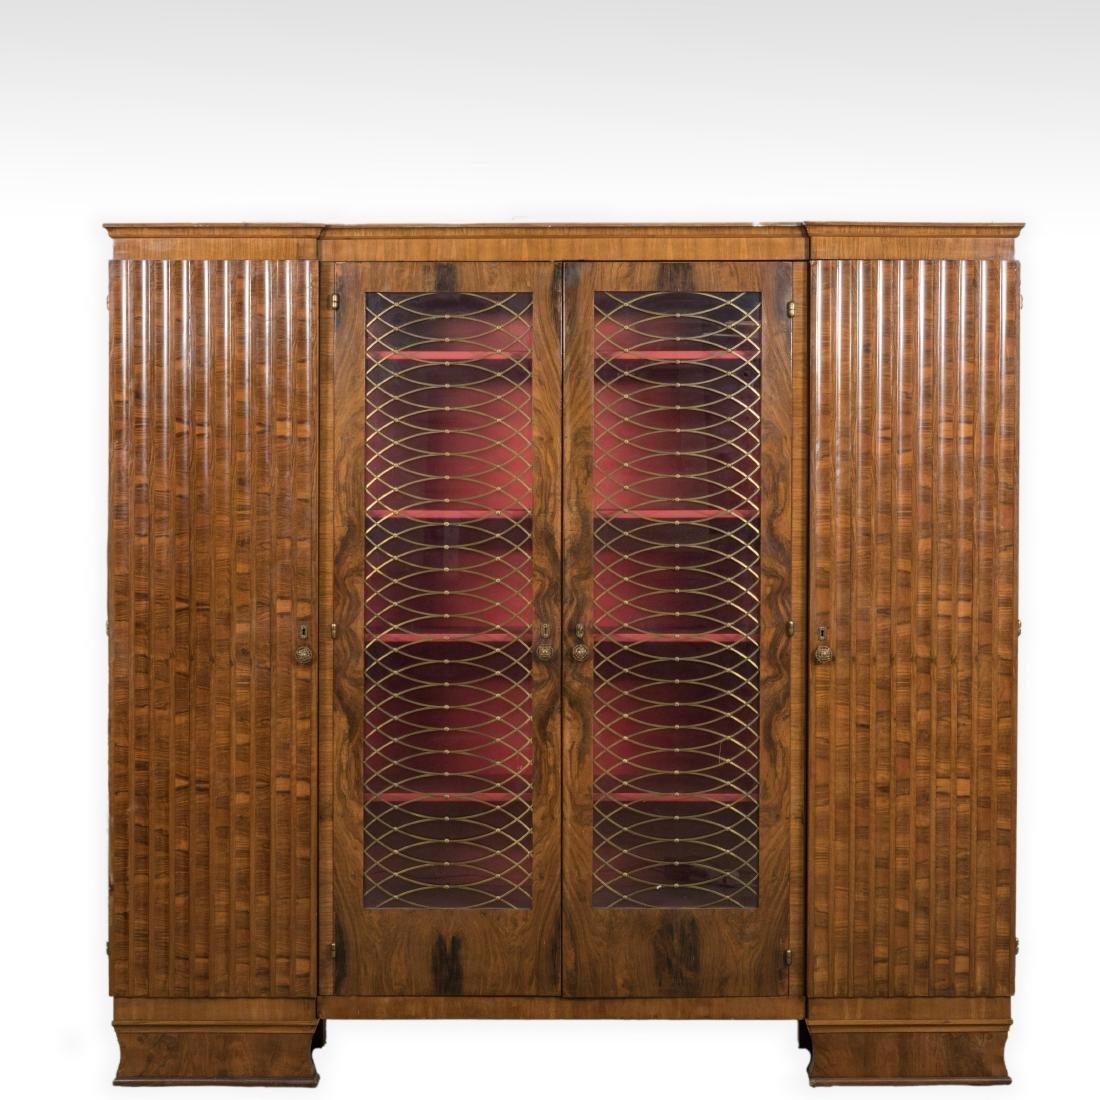 Burled English Art Deco Armoire - Epstein Brothers